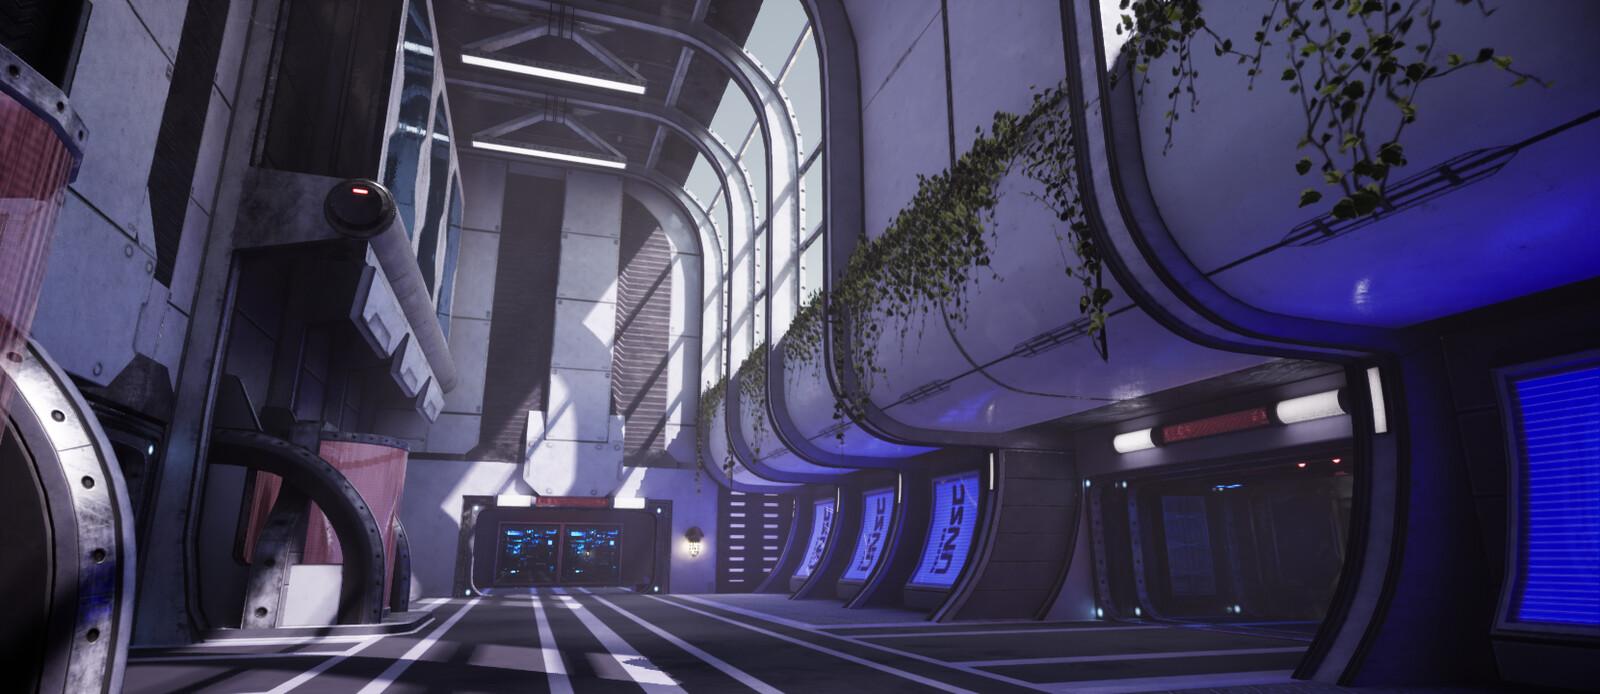 Orbital (From Halo 3)